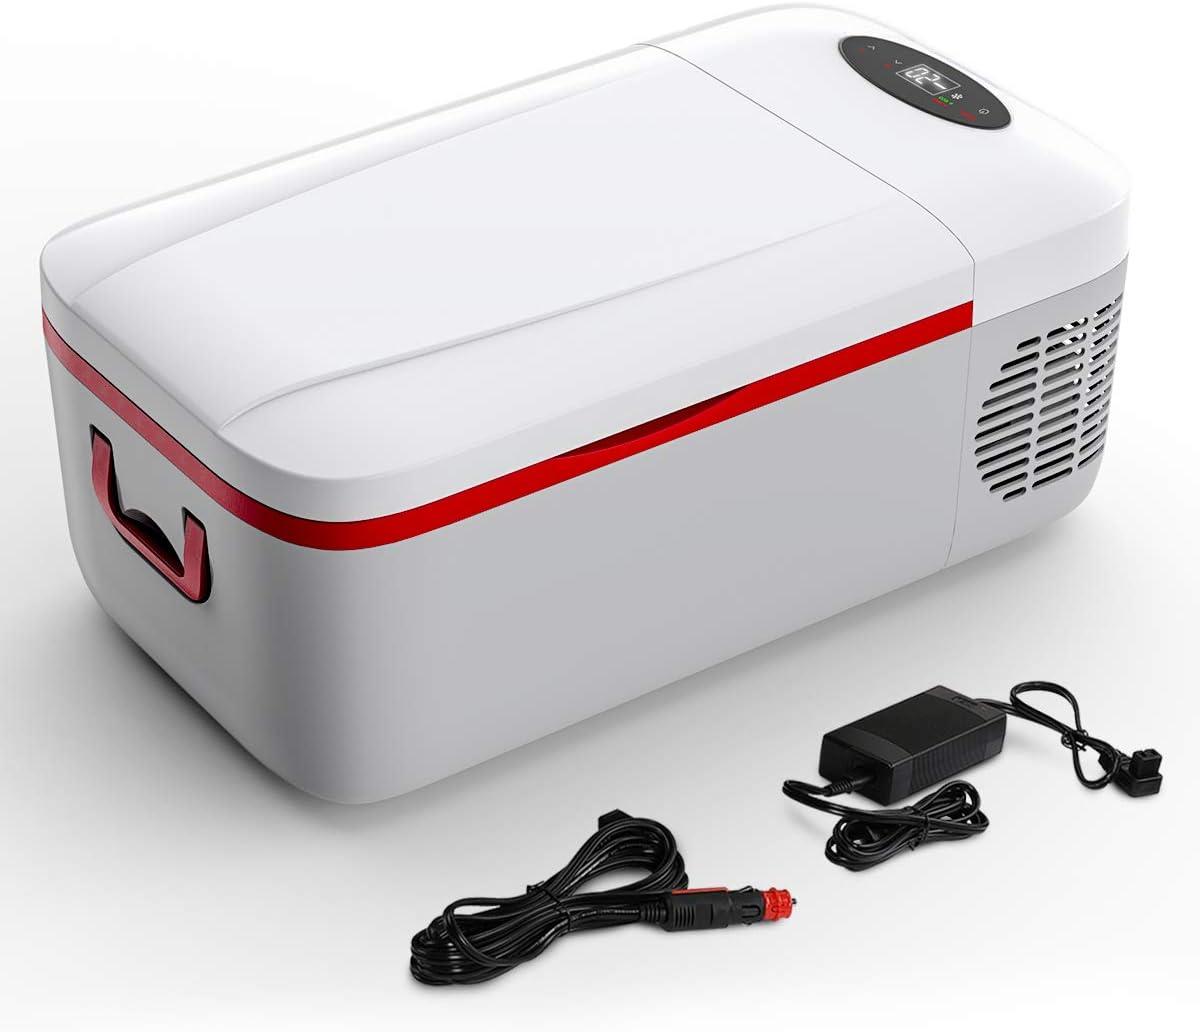 Portable Car Refrigerator, 13 Quarts / 12L Car Freezer Fridge Cooler with 12/24V DC & 110V AC, 12 Volt Electric Refrigerator for Car Home RV Camping Travel Room Boat Truckers Outdoors (-4℉ to 50℉)